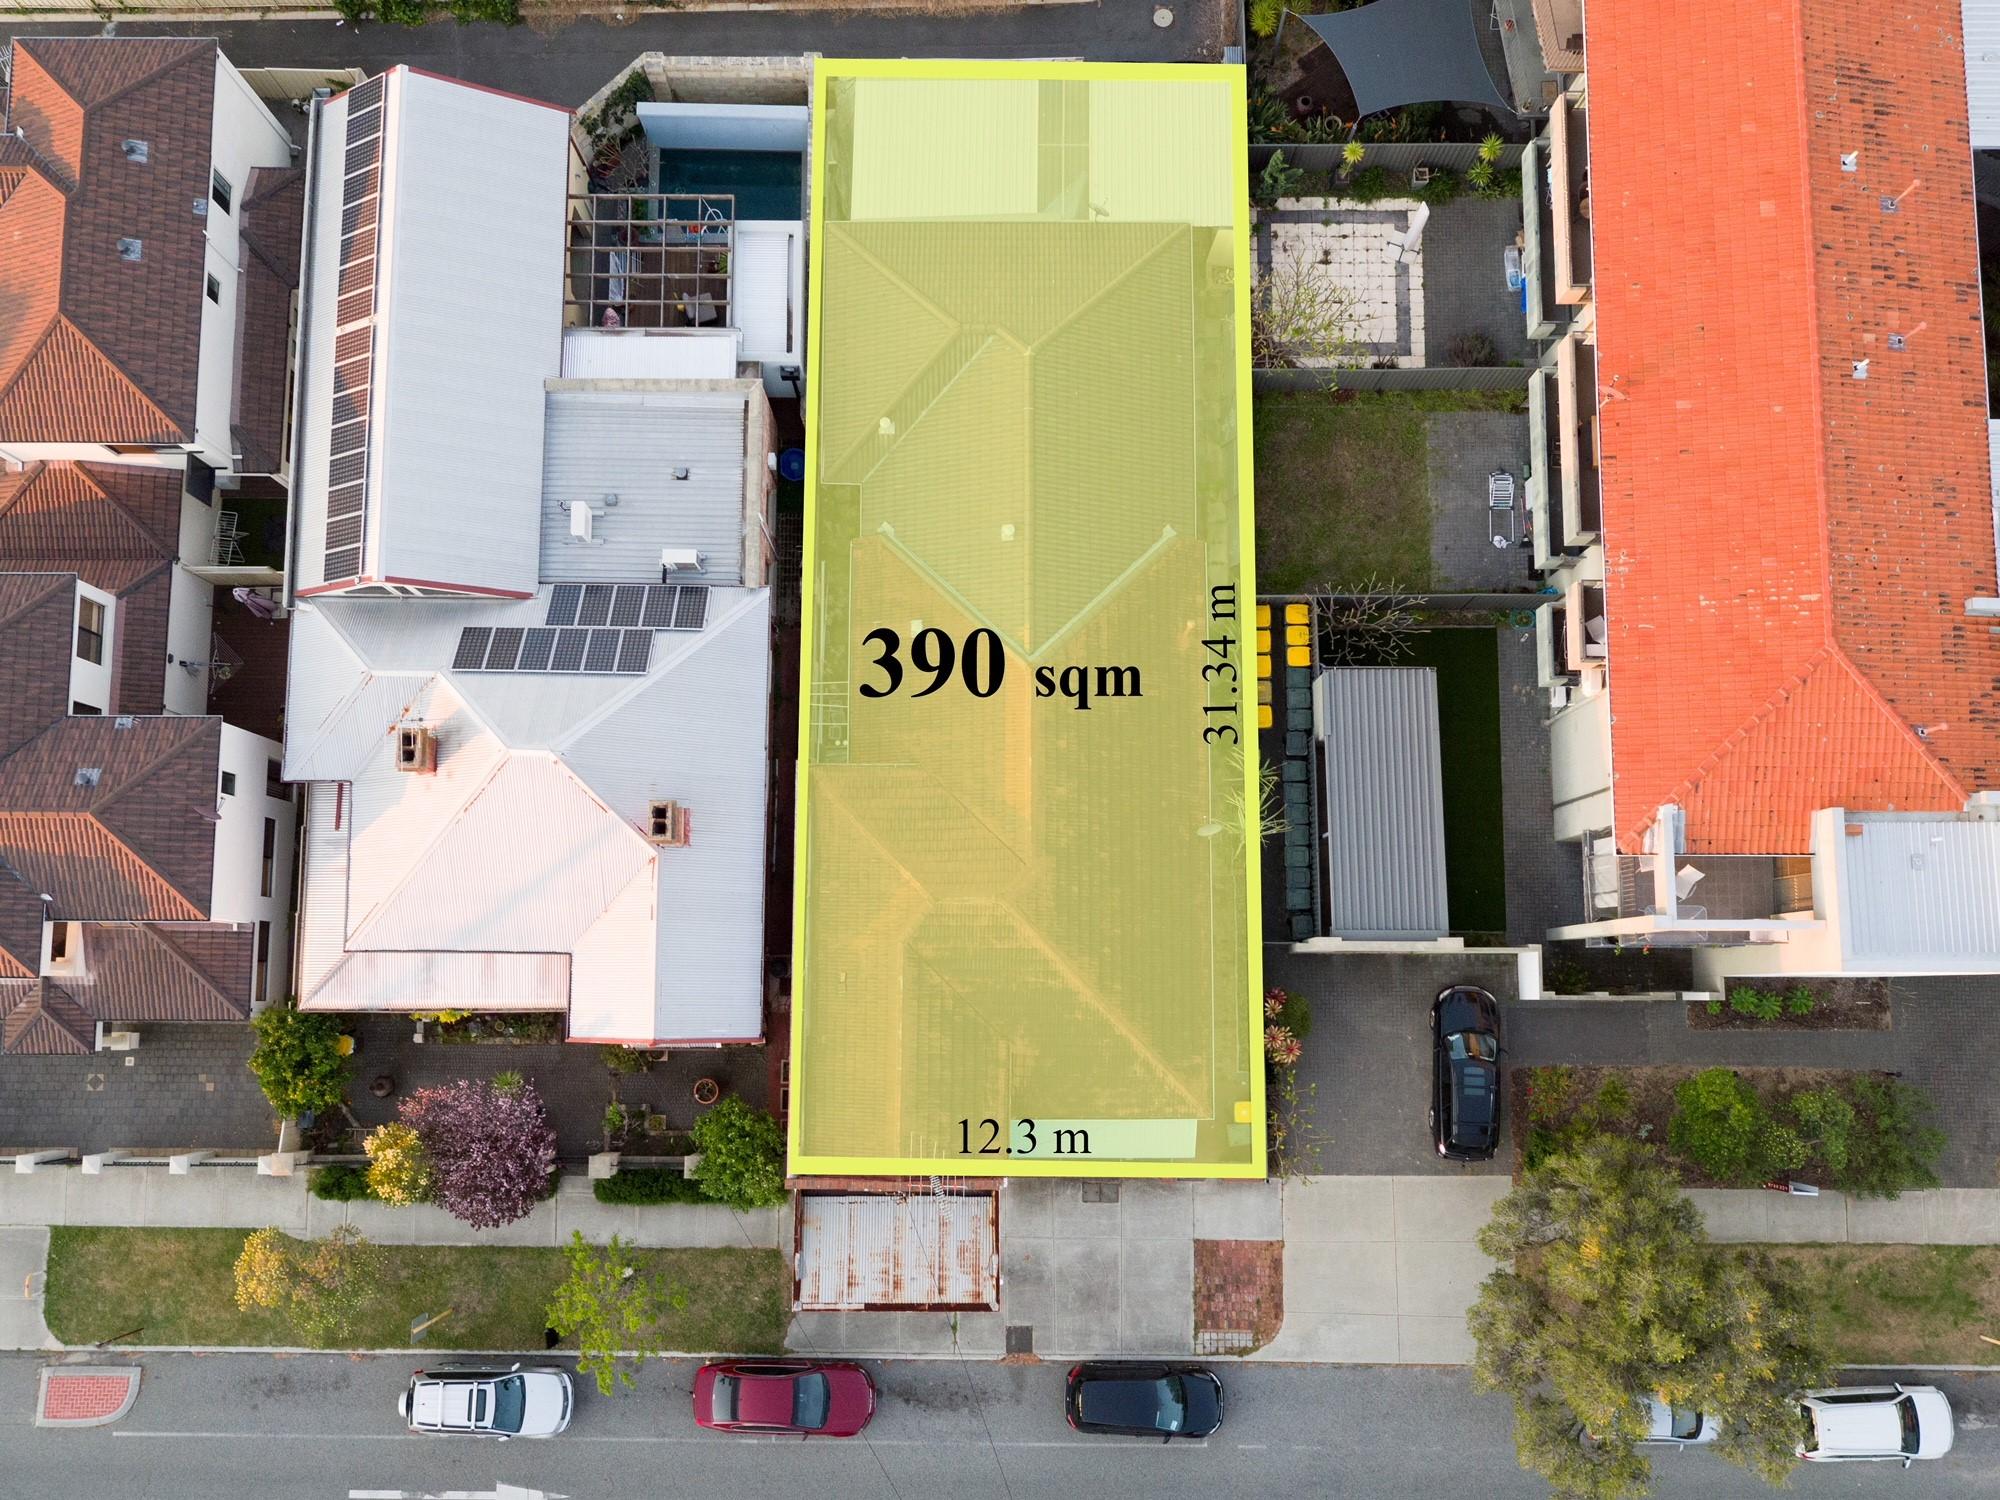 Google overlay 160 Linoln street Highgat